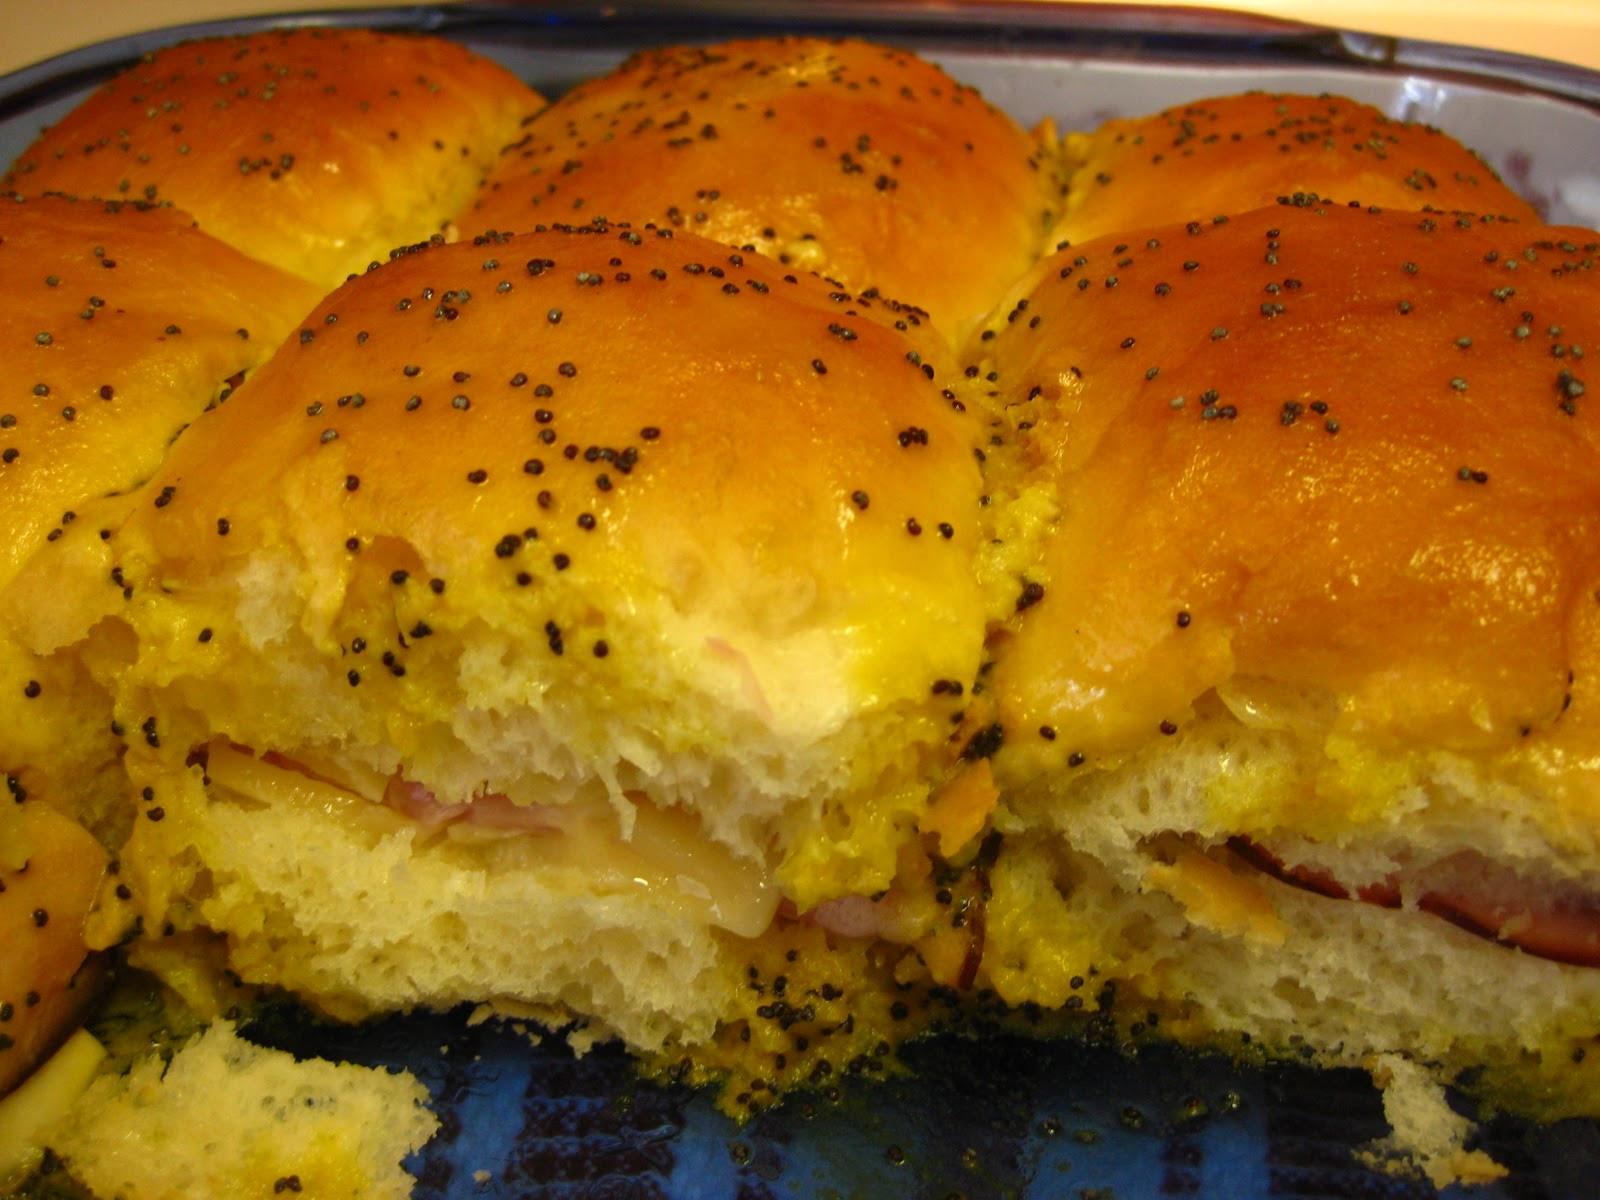 Hot Ham And Cheese Sandwiches  Anna Can Cook Hot Ham & Cheese Sandwiches